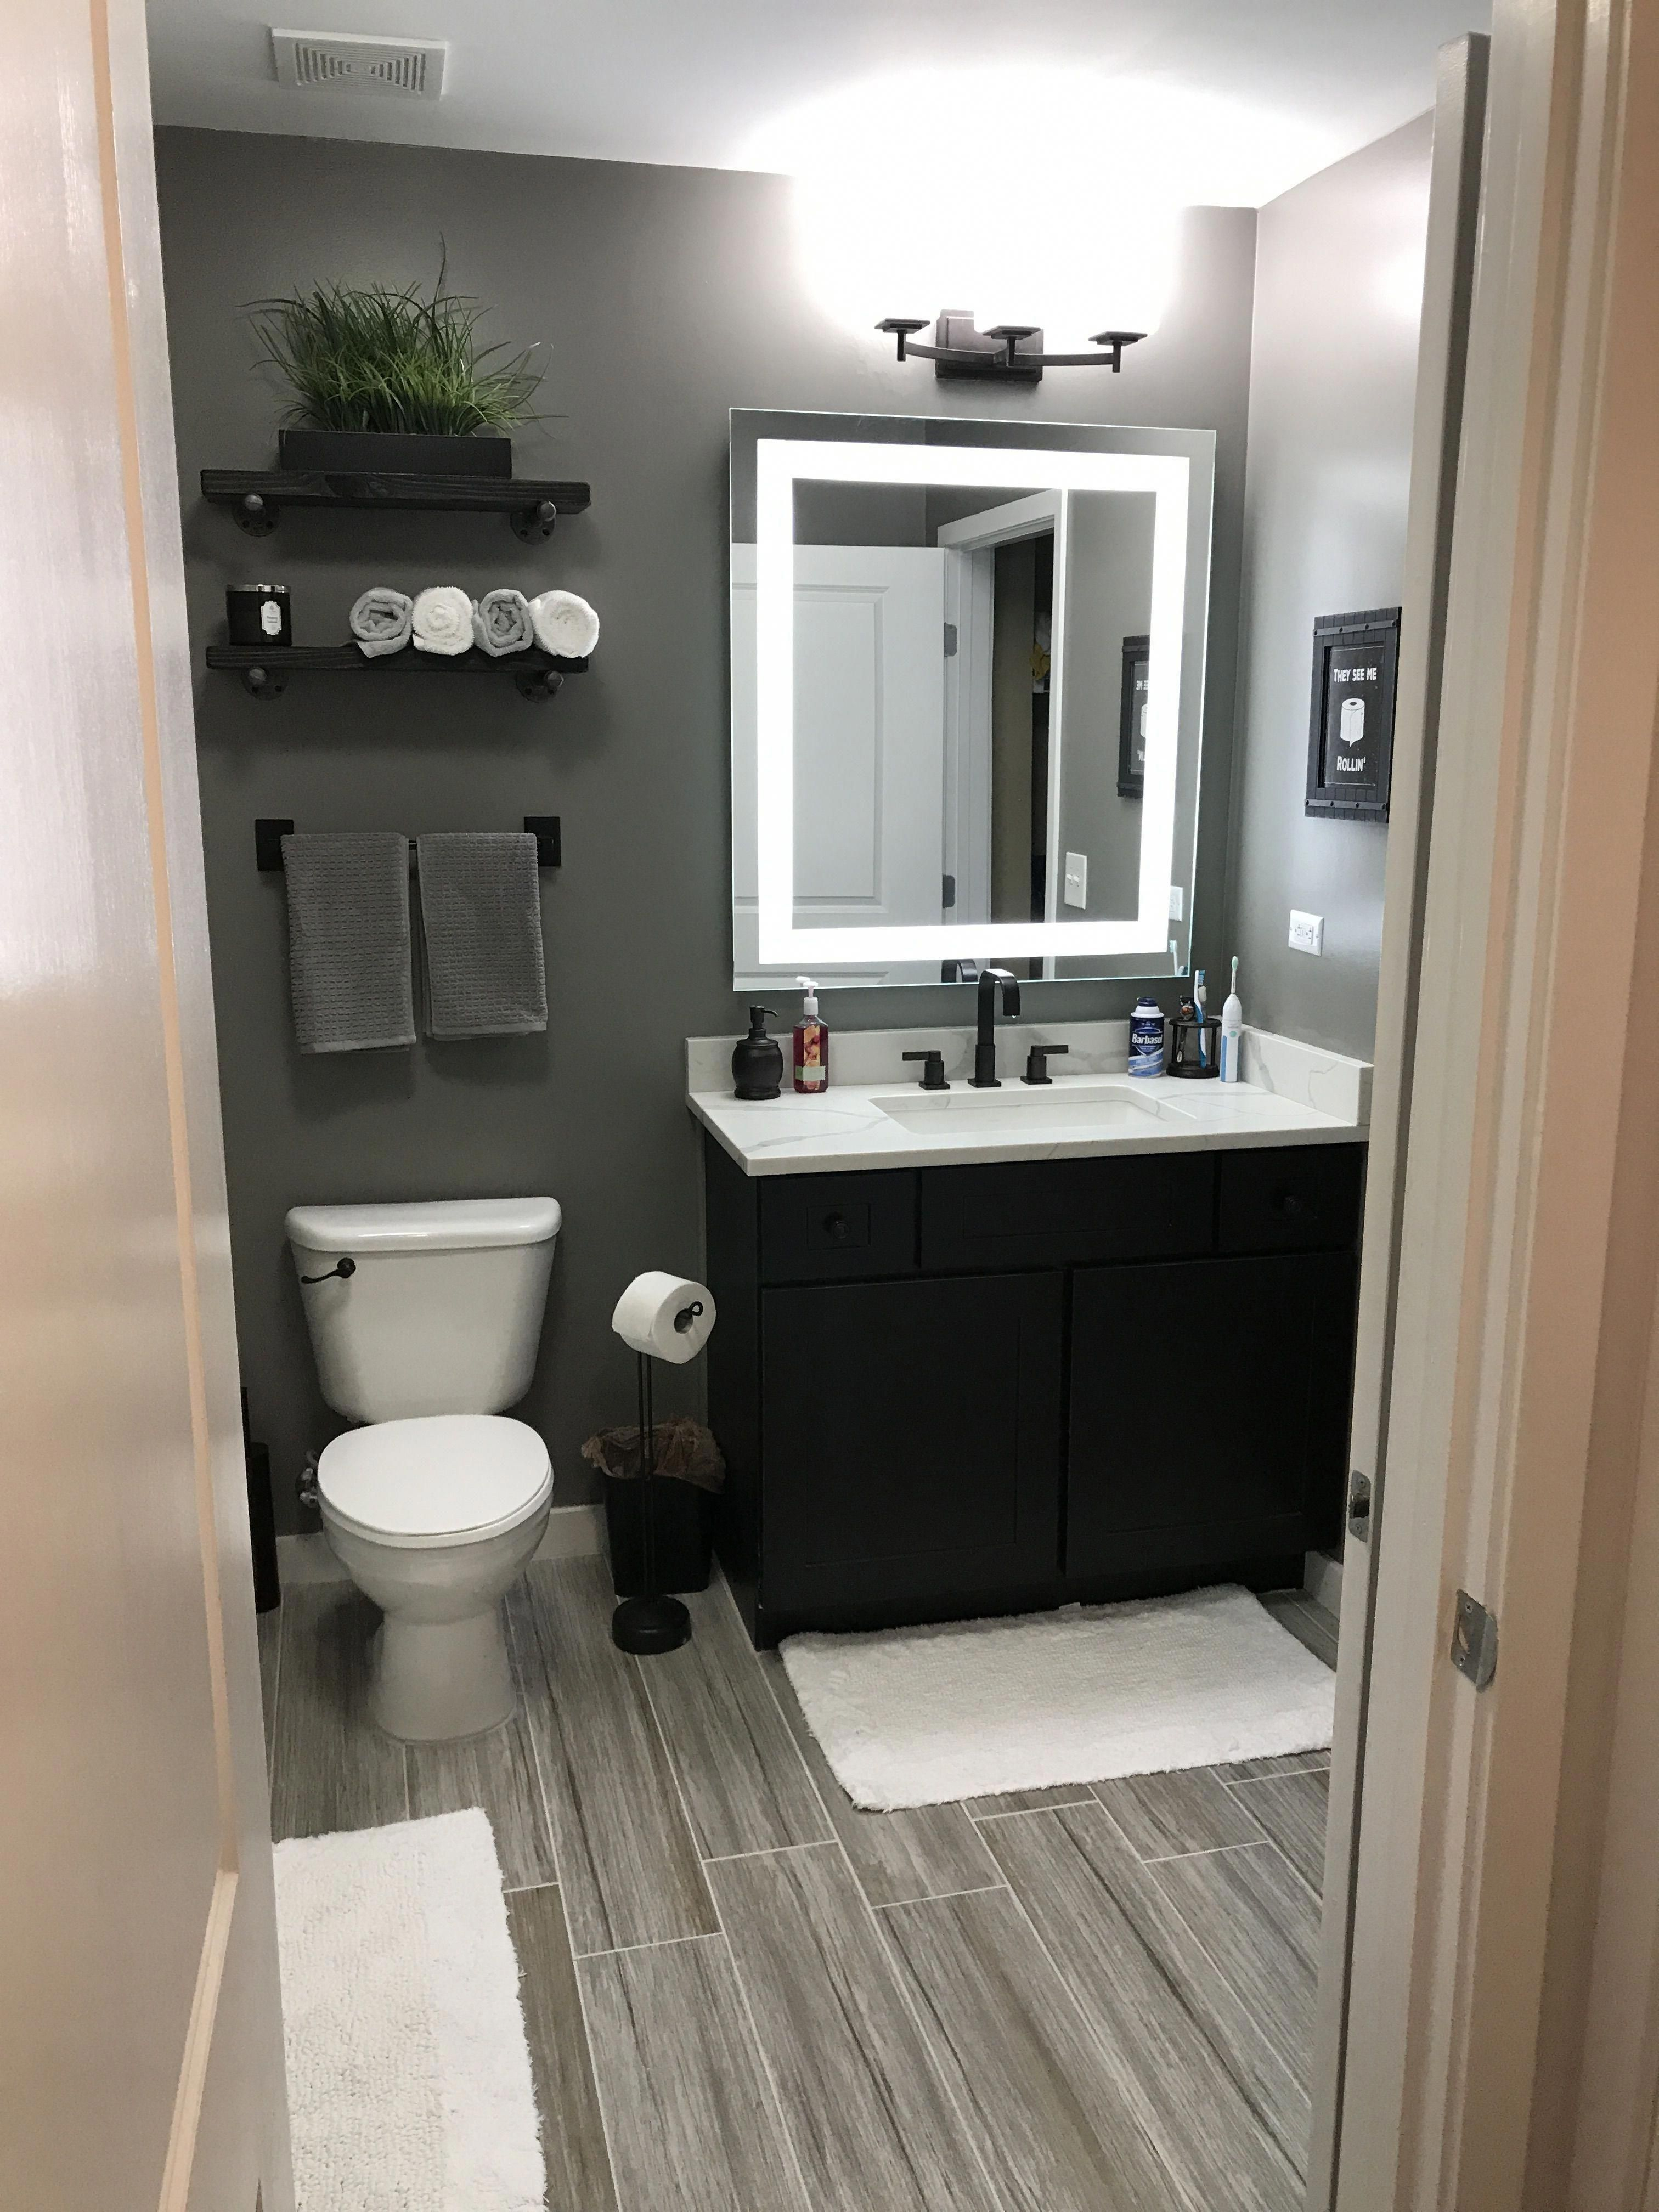 Guestbathroom Small Bathroom Makeover Small Bathroom Decor Man Bathroom Small guest bathroom design